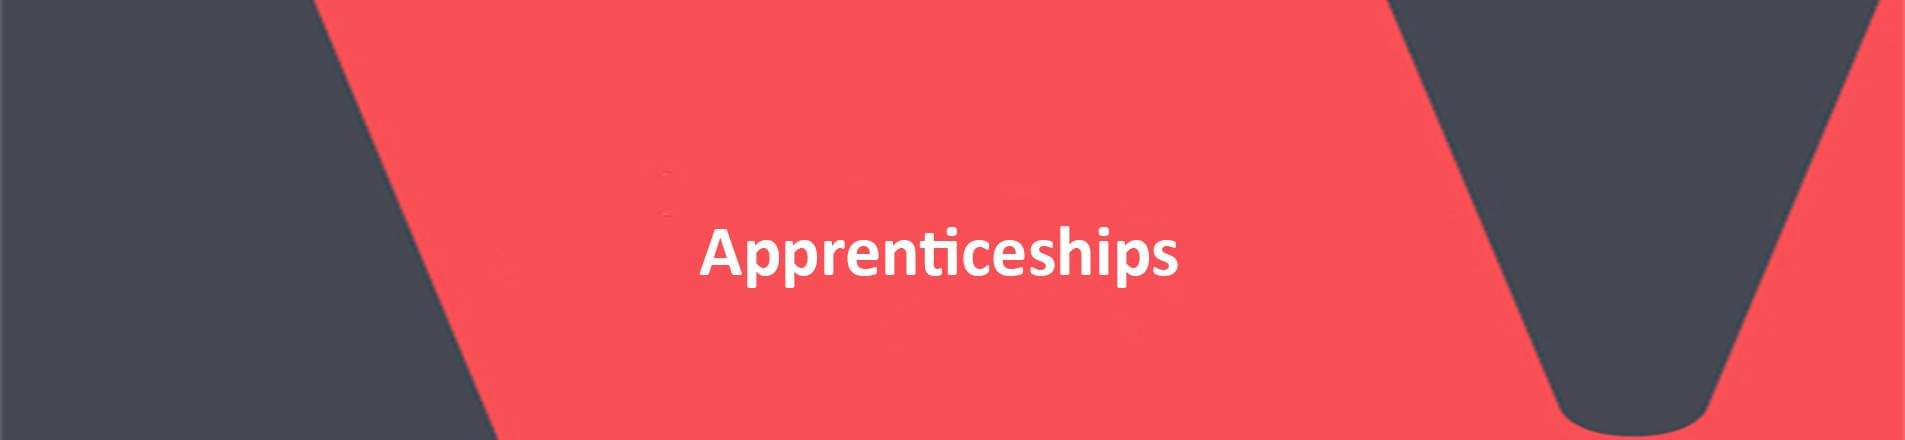 The word 'Apprenticeship' on red VERCIDA background